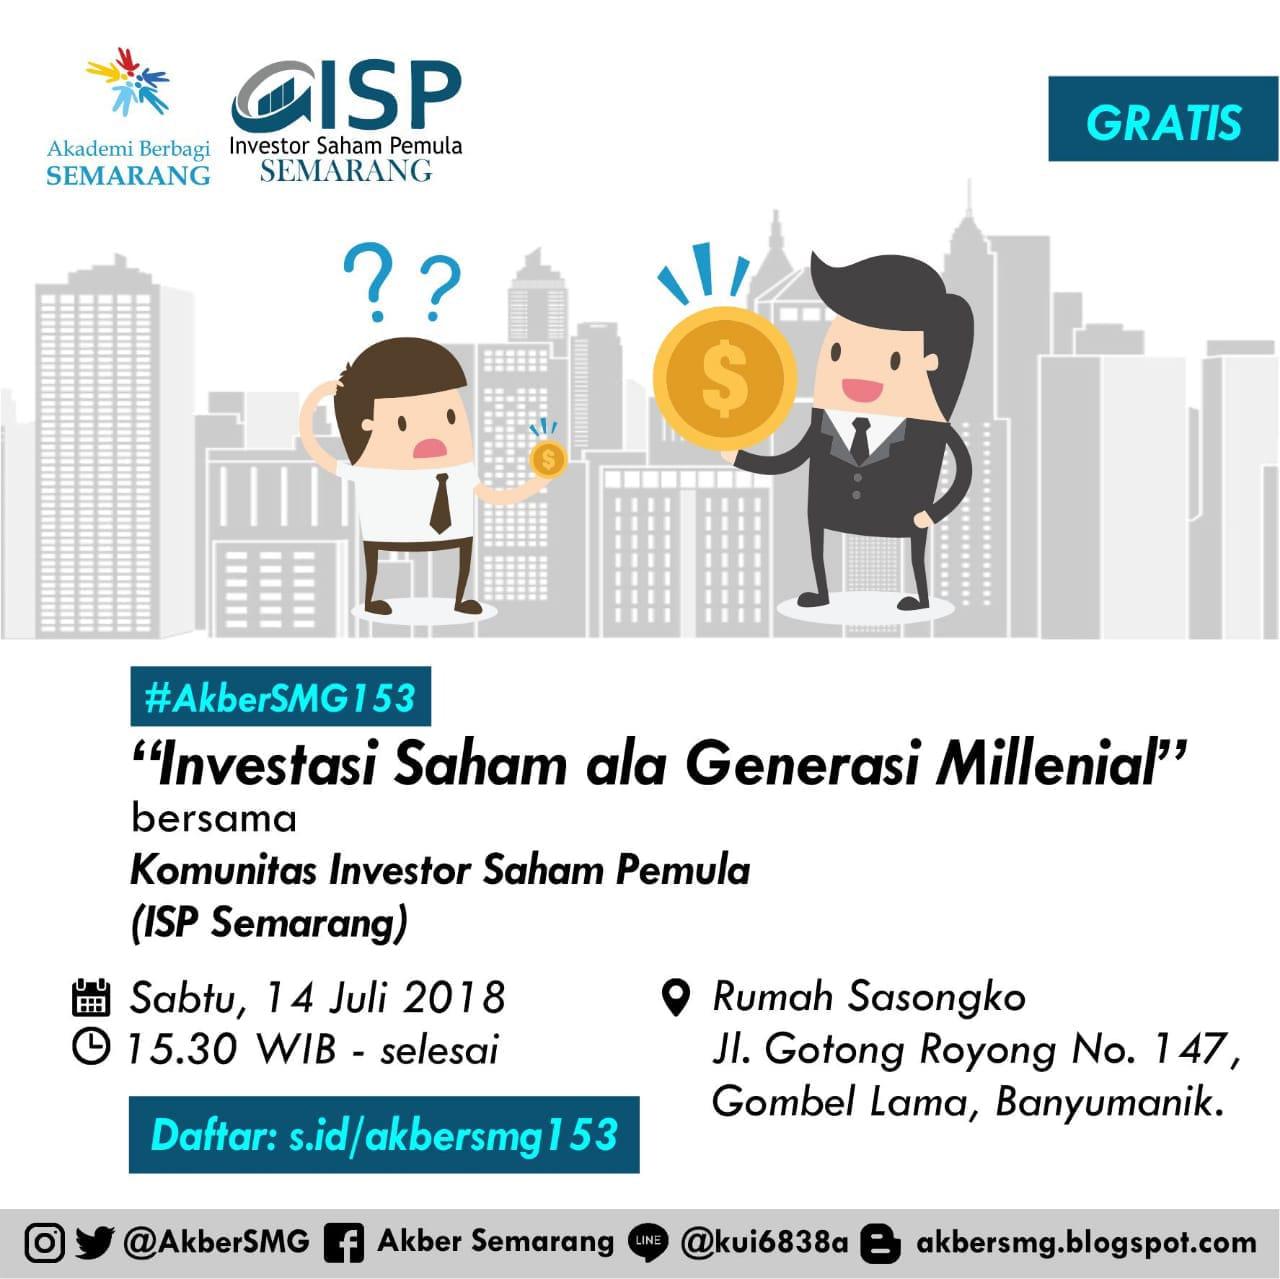 Semarang: Investasi Saham Ala Generasi Millenial